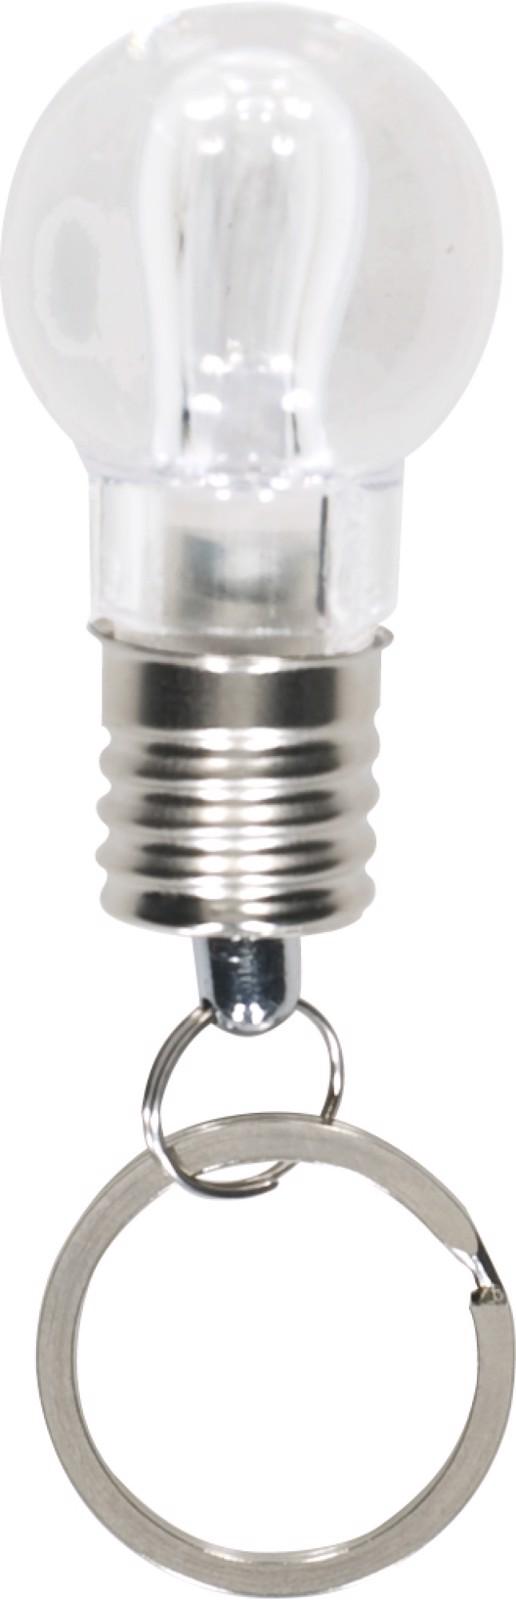 PS 2-in-1 key holder